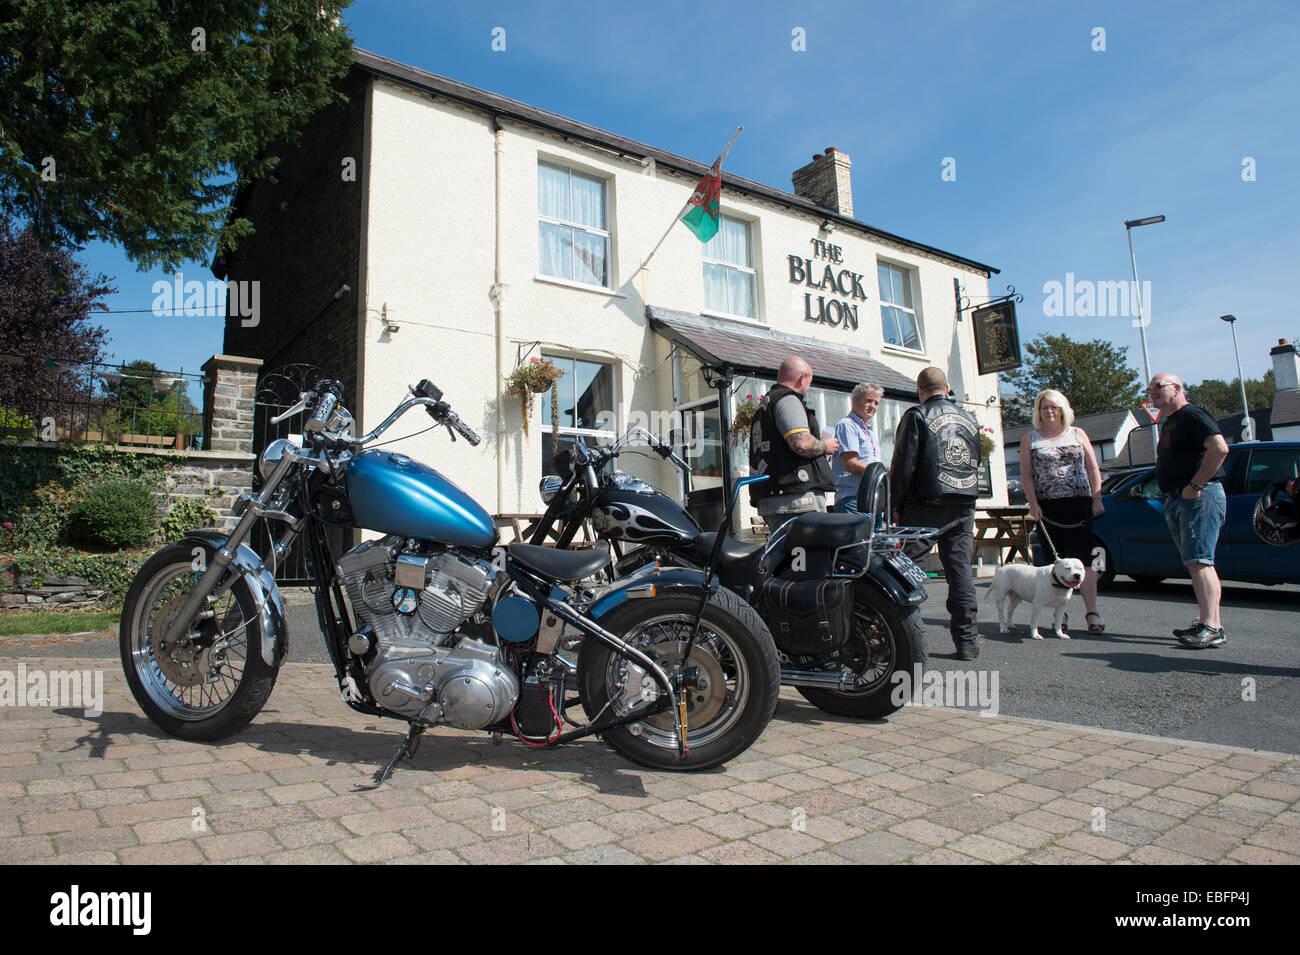 Black Lion pub, Llanbadarn Aberystwyth Wales UK, a village pub popular with motorcyclists bikers. - Stock Image